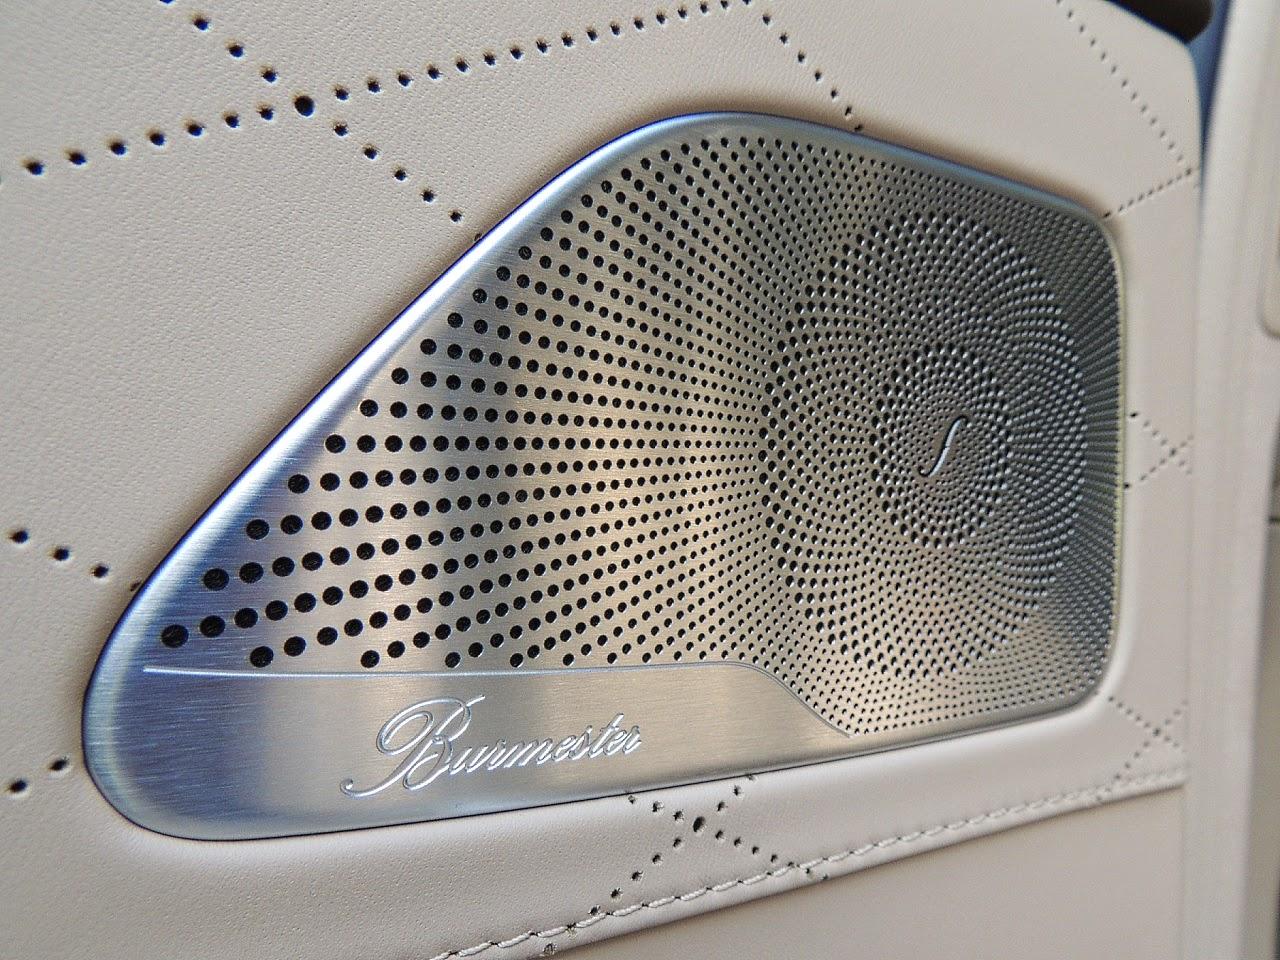 Mercedes S 500 L 4MATIC - głośnik systemu audio Burmester Surround